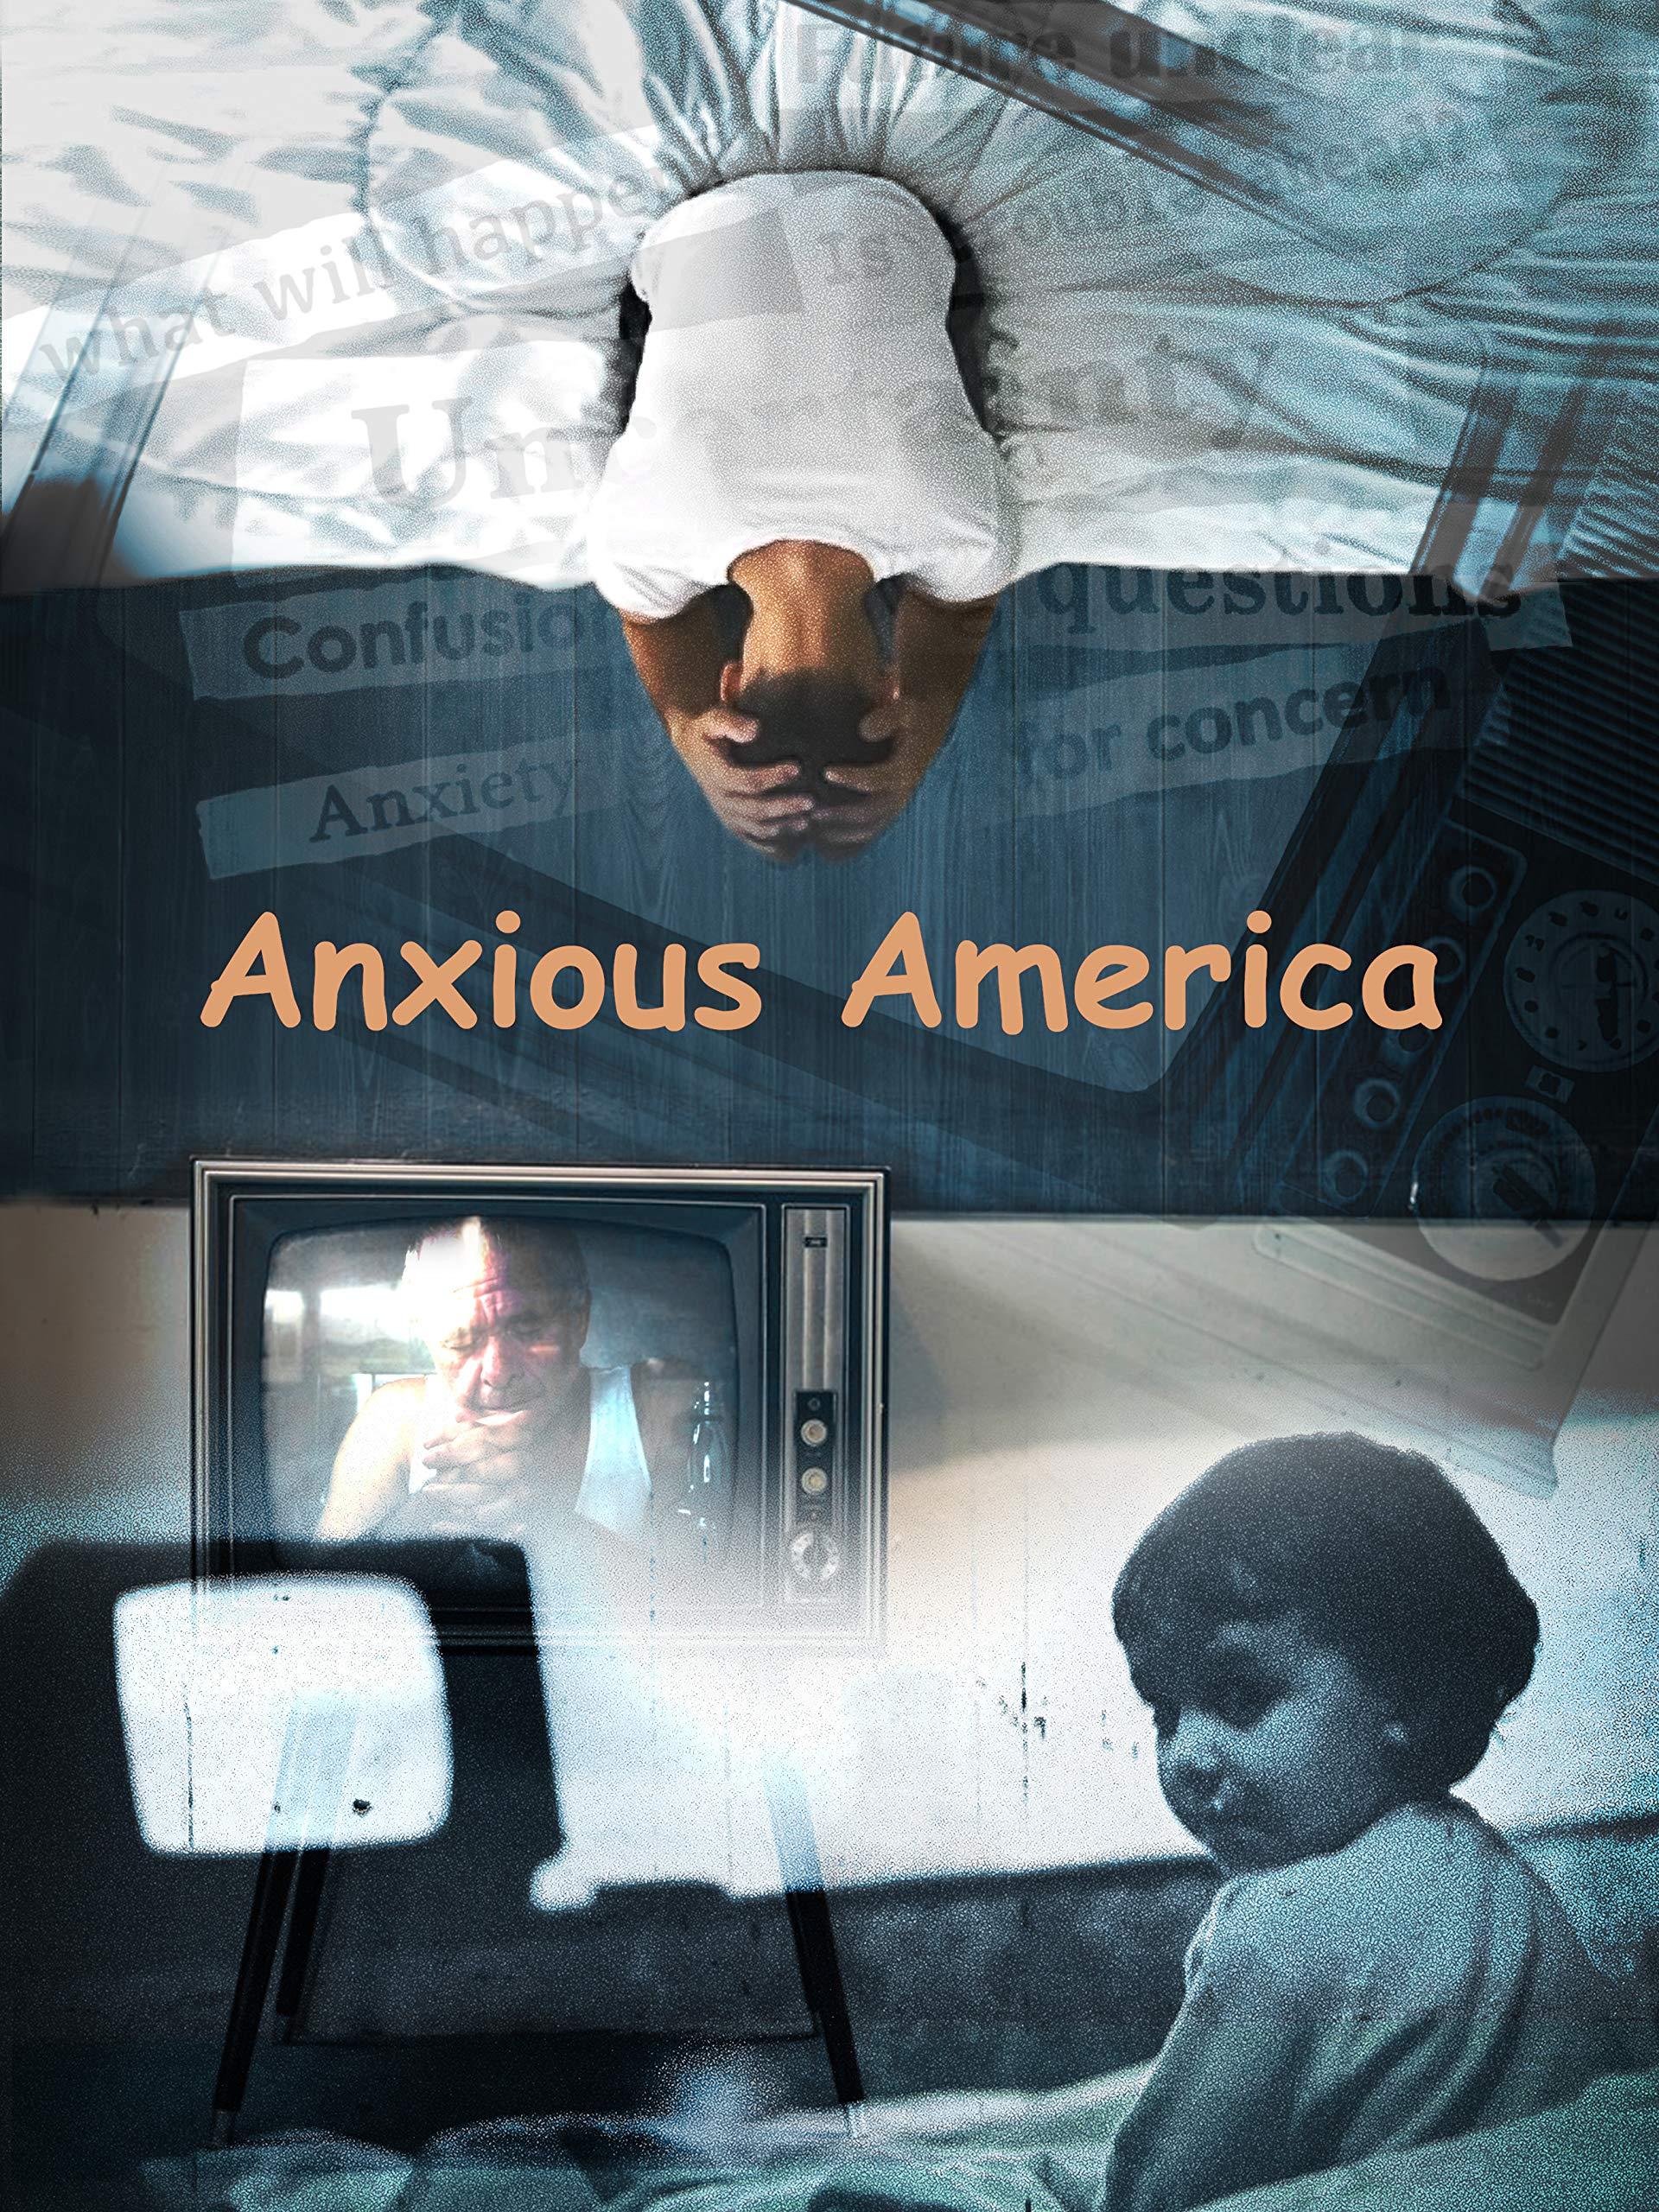 Anxious America